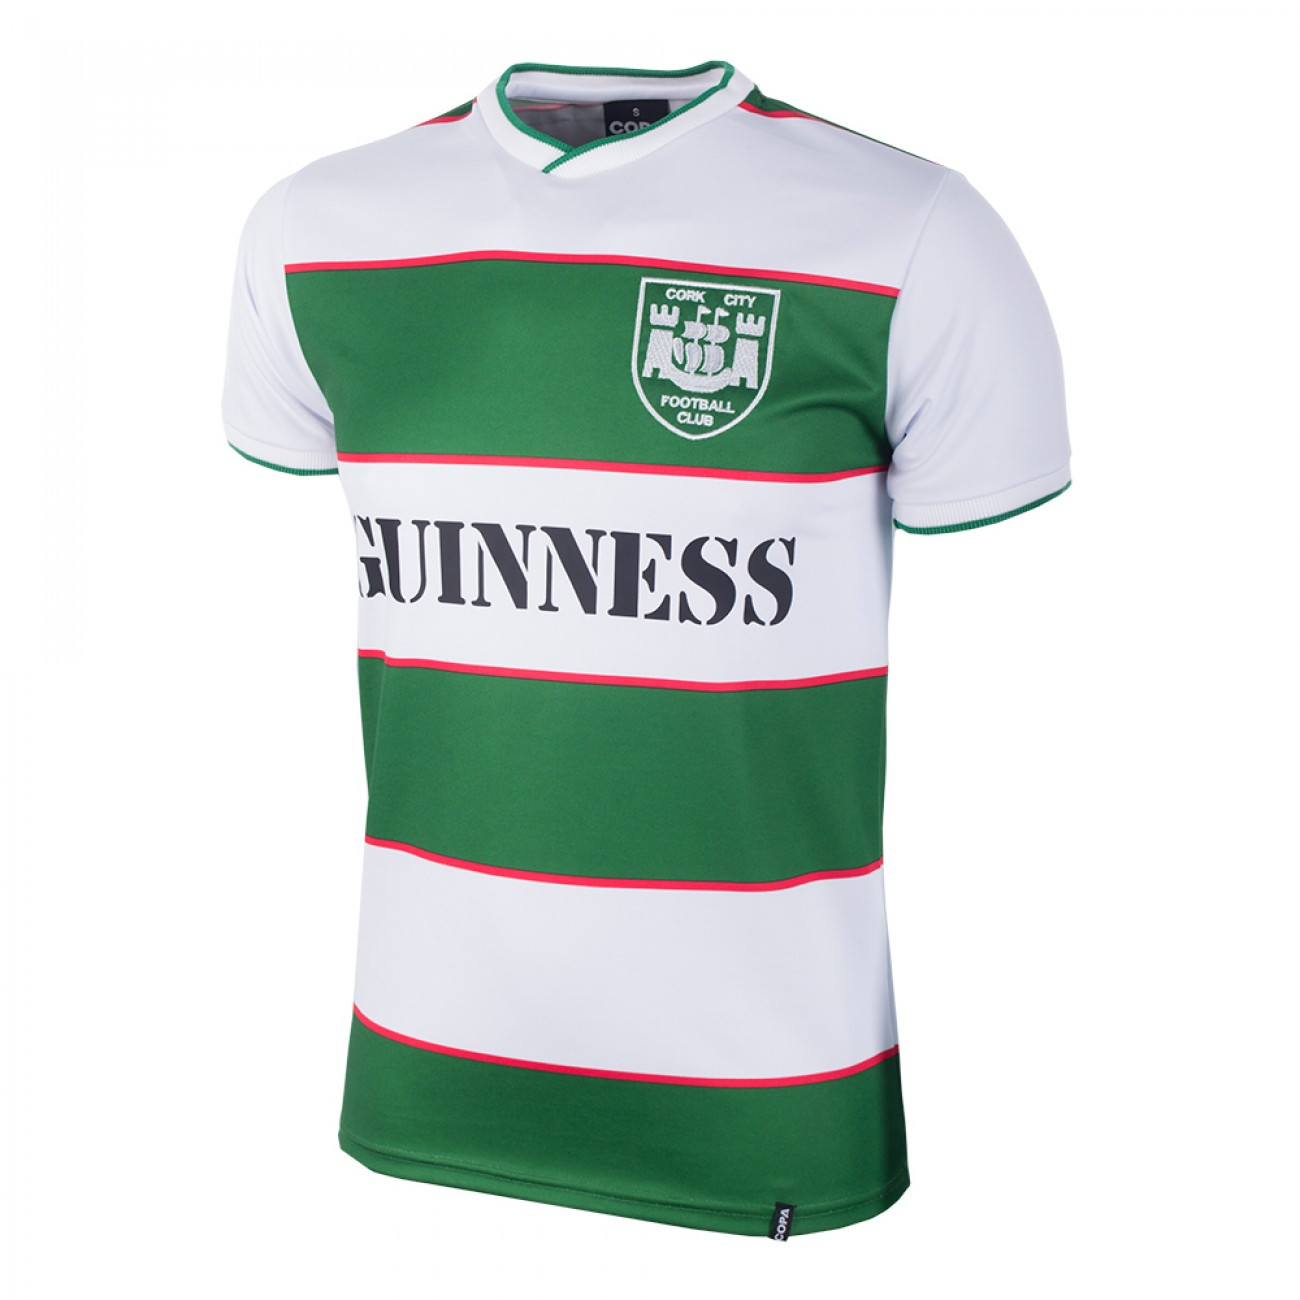 http://www.retrofootball.es/ropa-de-futbol/camiseta-cork-city-1984.html